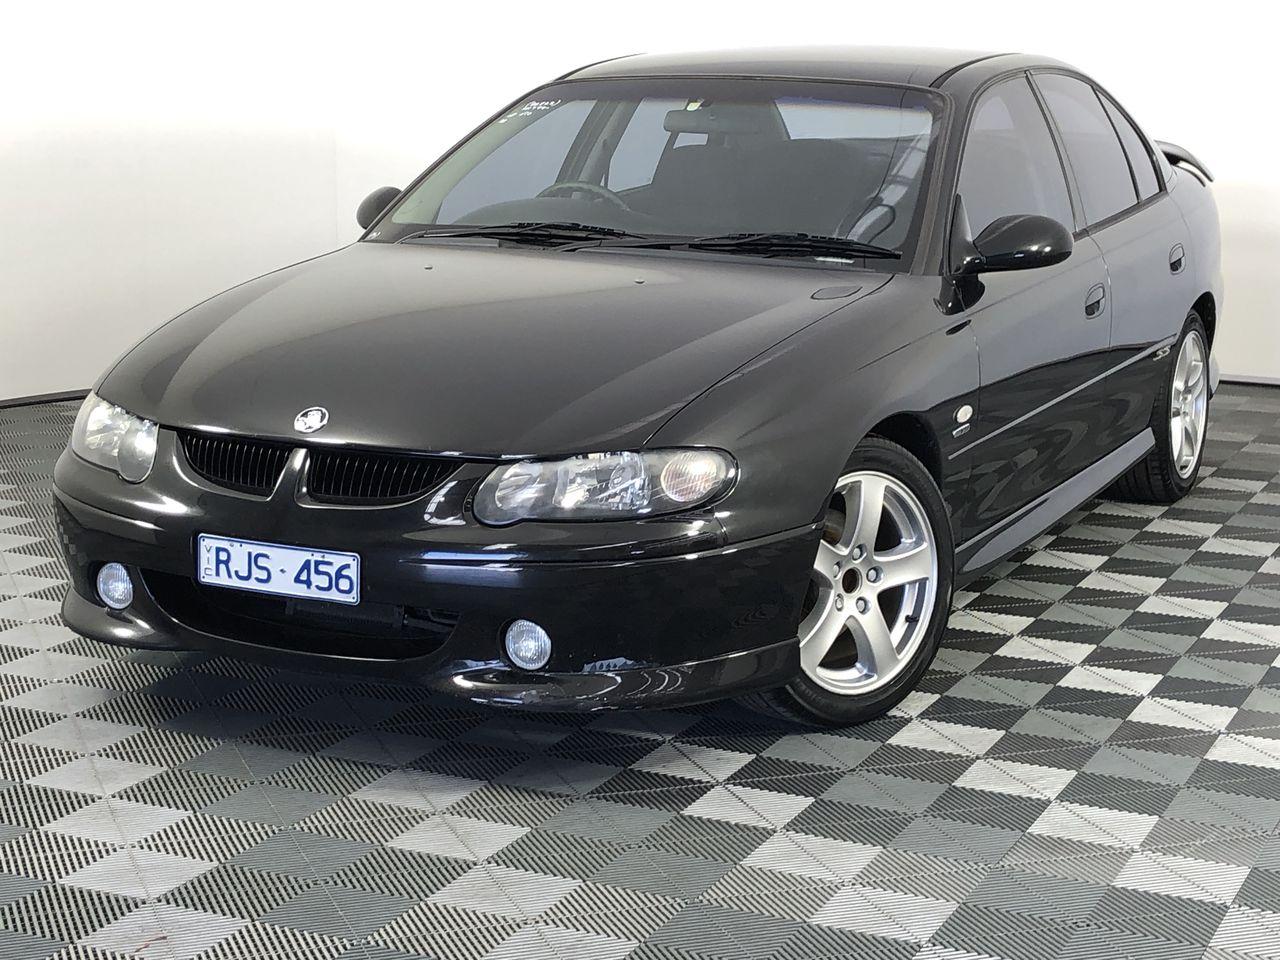 2001 Holden Commodore SS VX Automatic Sedan